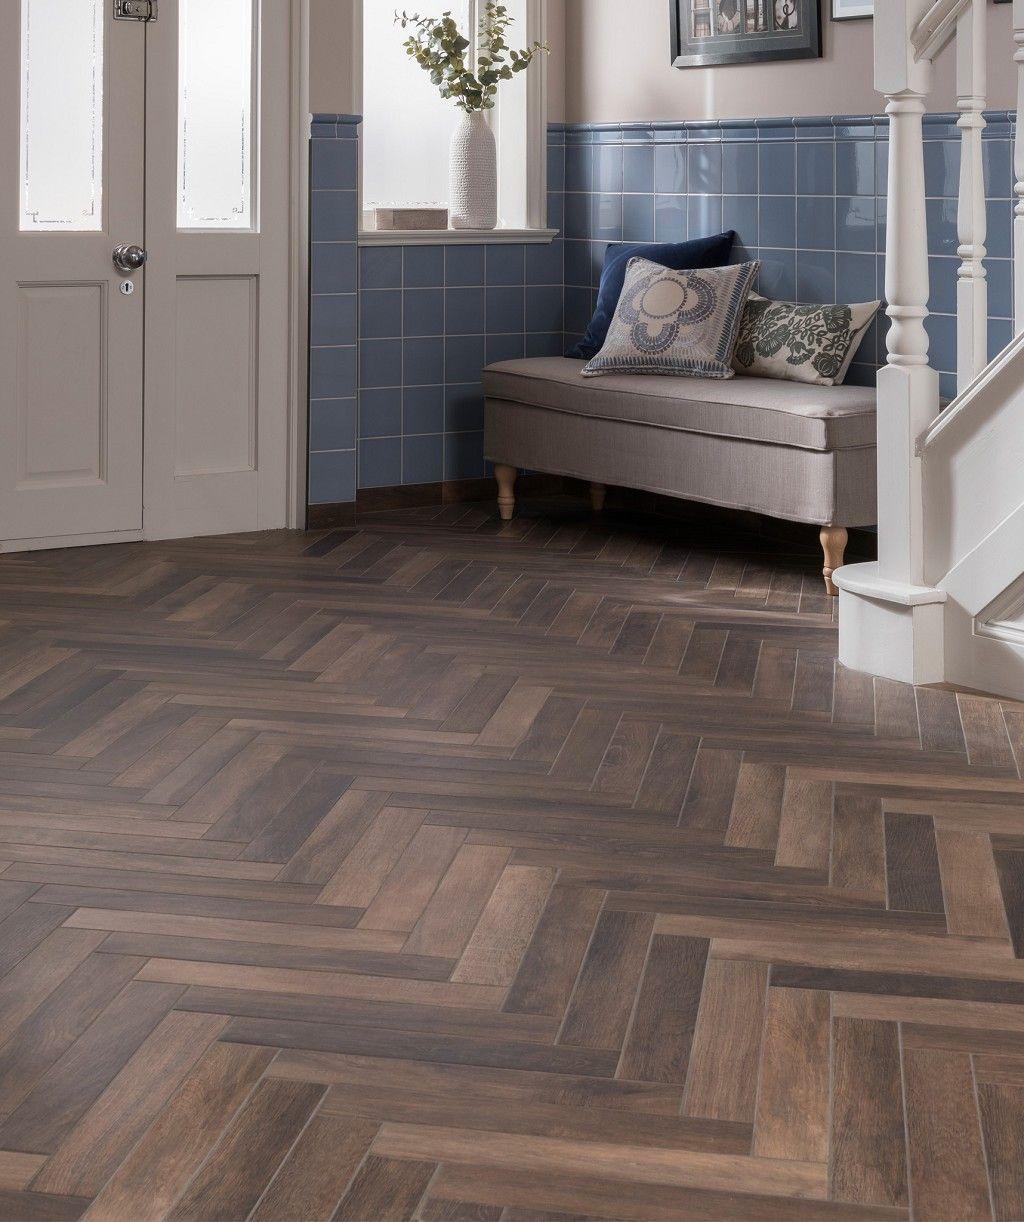 Andira™ Smokey Brown Tile Wood floor design, Herringbone